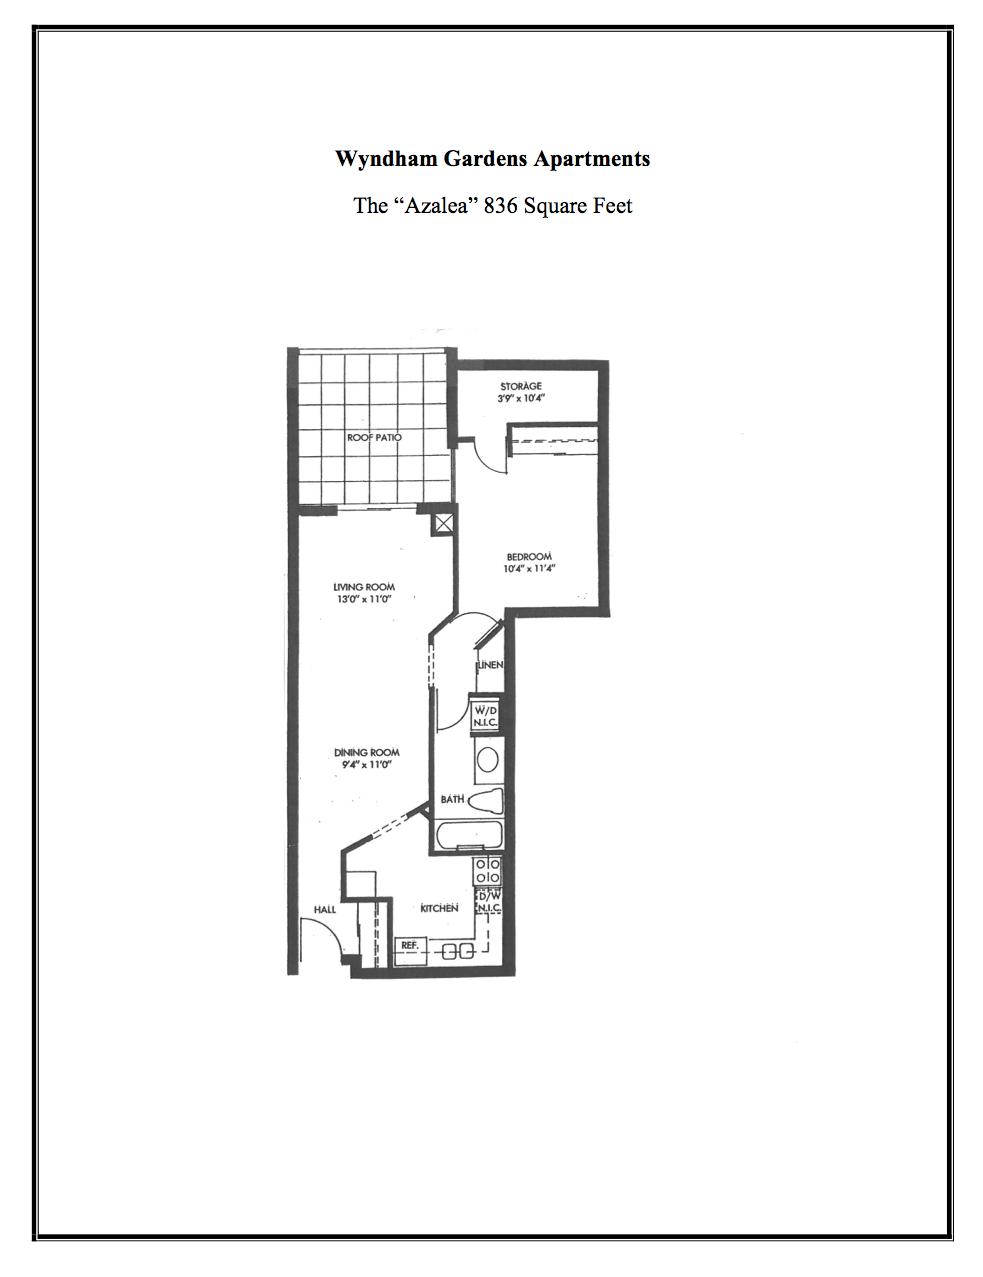 Salon floor plan maker free best free home design for Salon floor plan maker